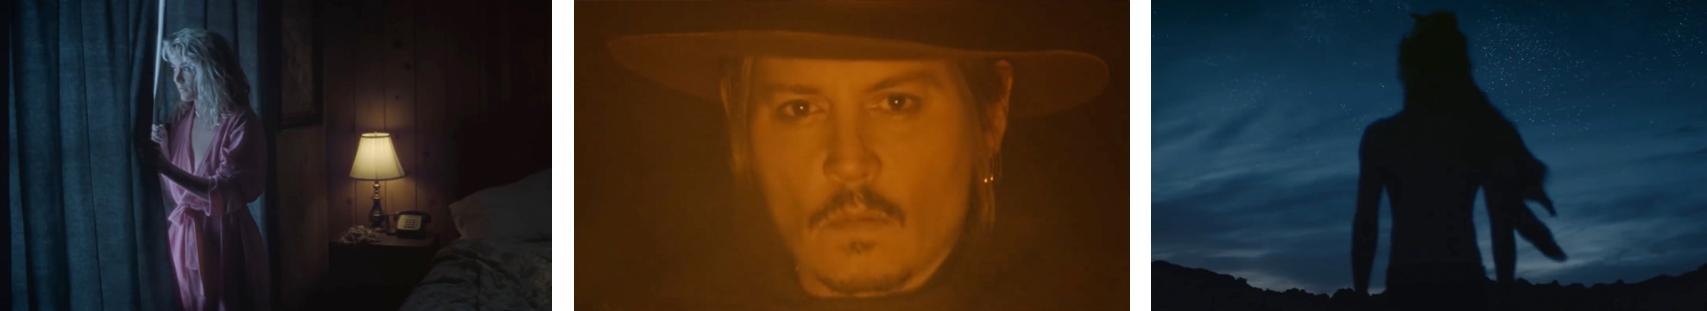 "DIOR  SAUVAGE I ""THE LEGEND OF THE MAGIC HOUR"" I Dir. CLEMENT BEAUVAIS"